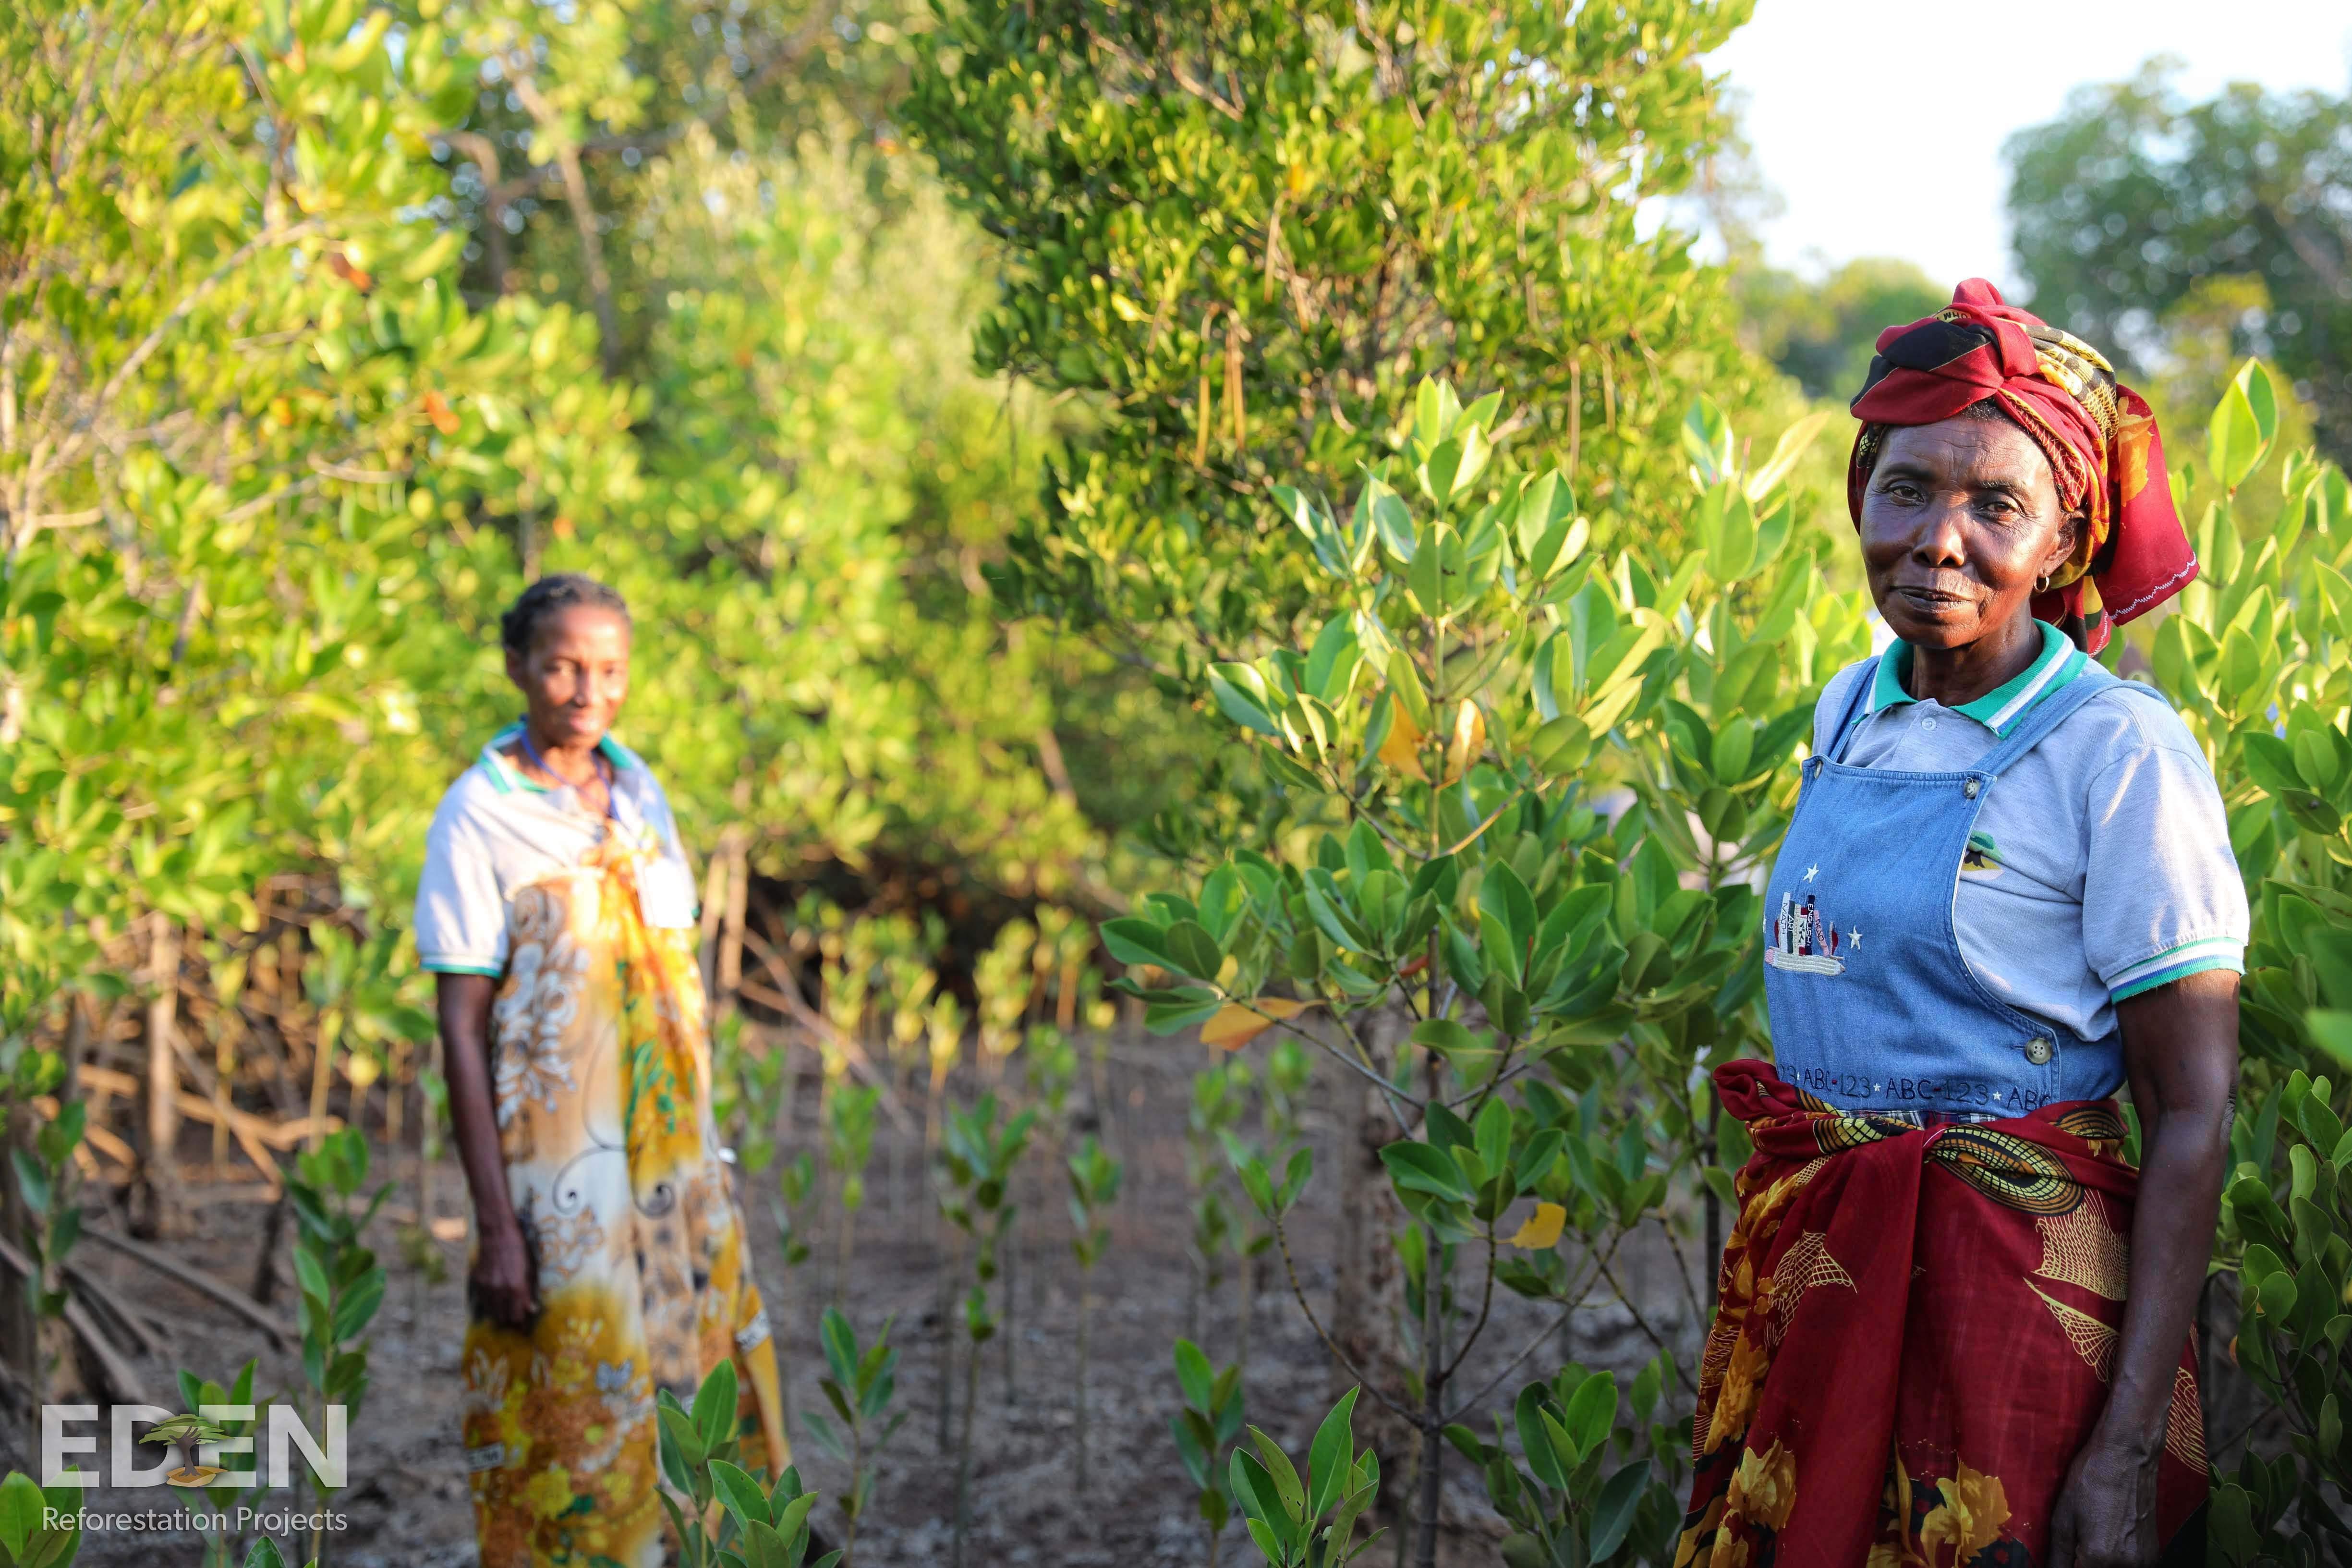 Eden in Madagascar